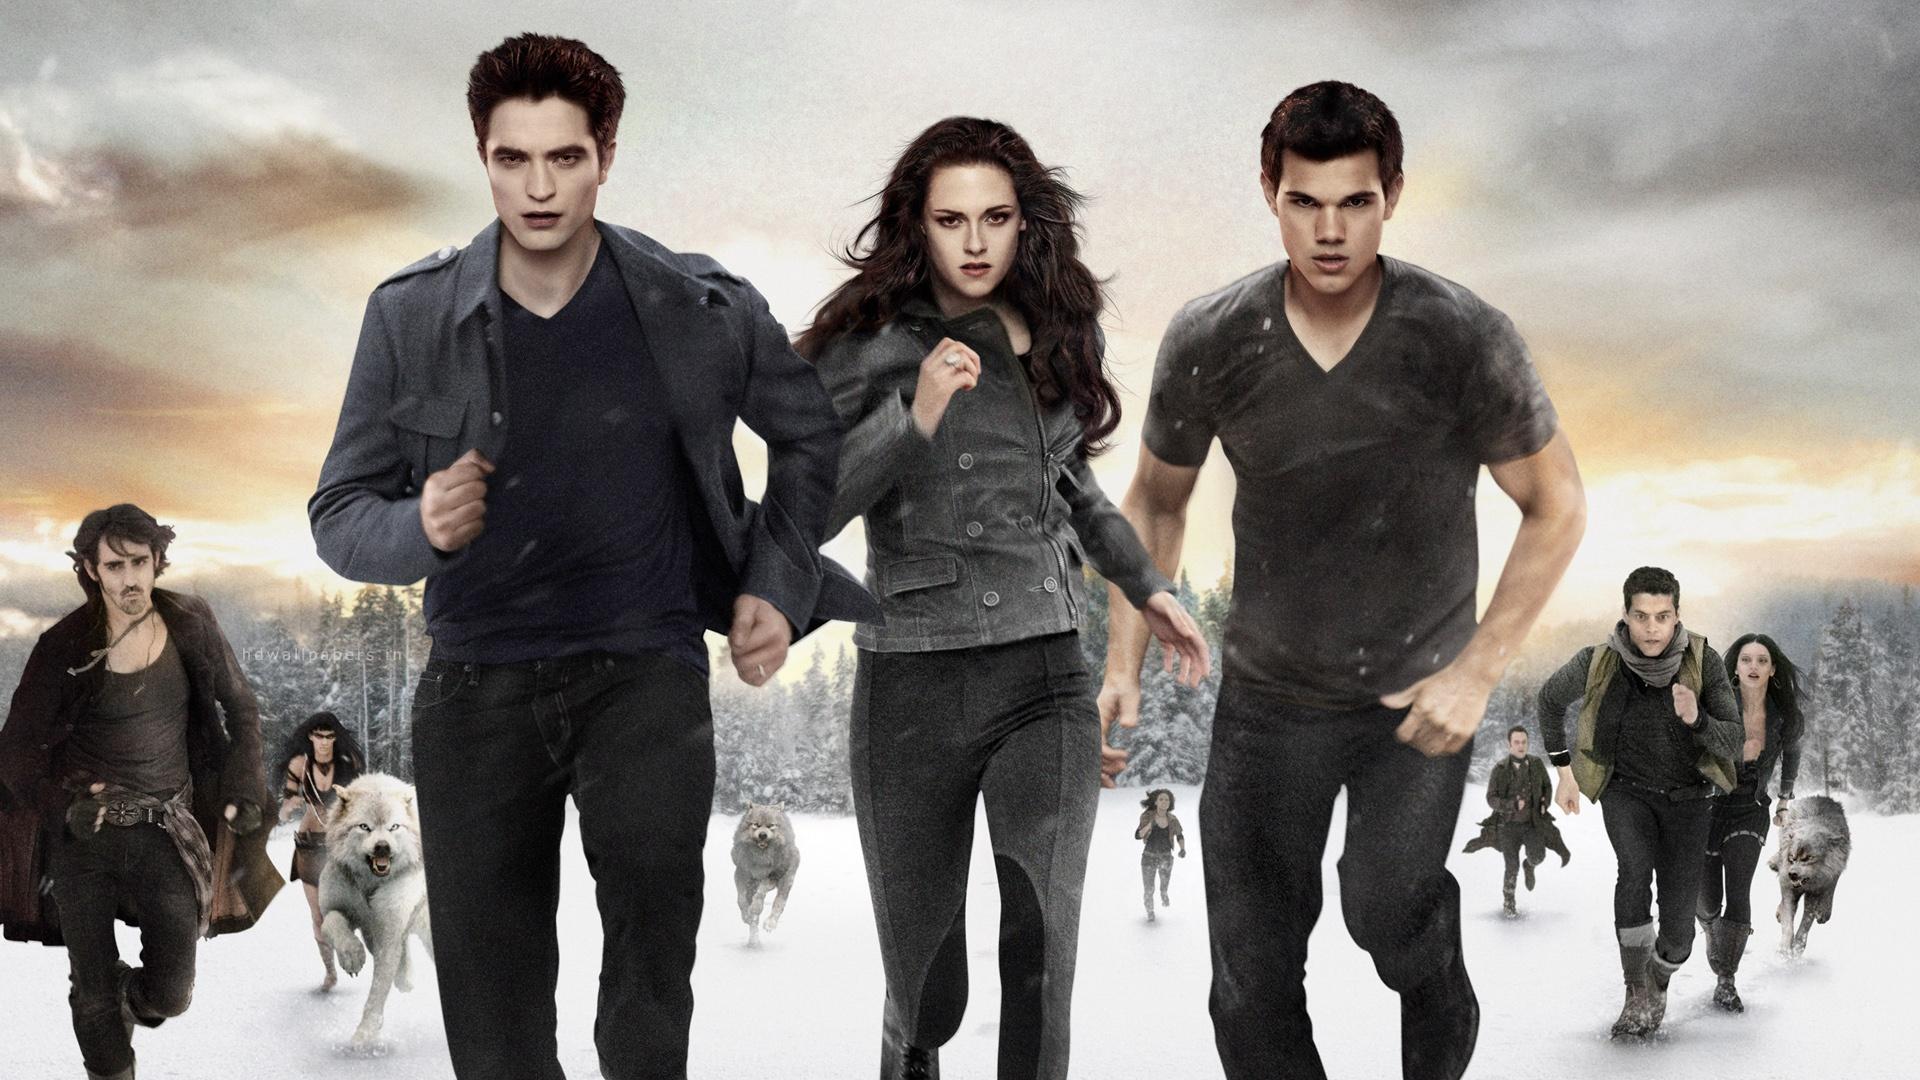 The Twilight Saga Breaking Dawn Part 2 HD Wallpapers   All HD 1920x1080